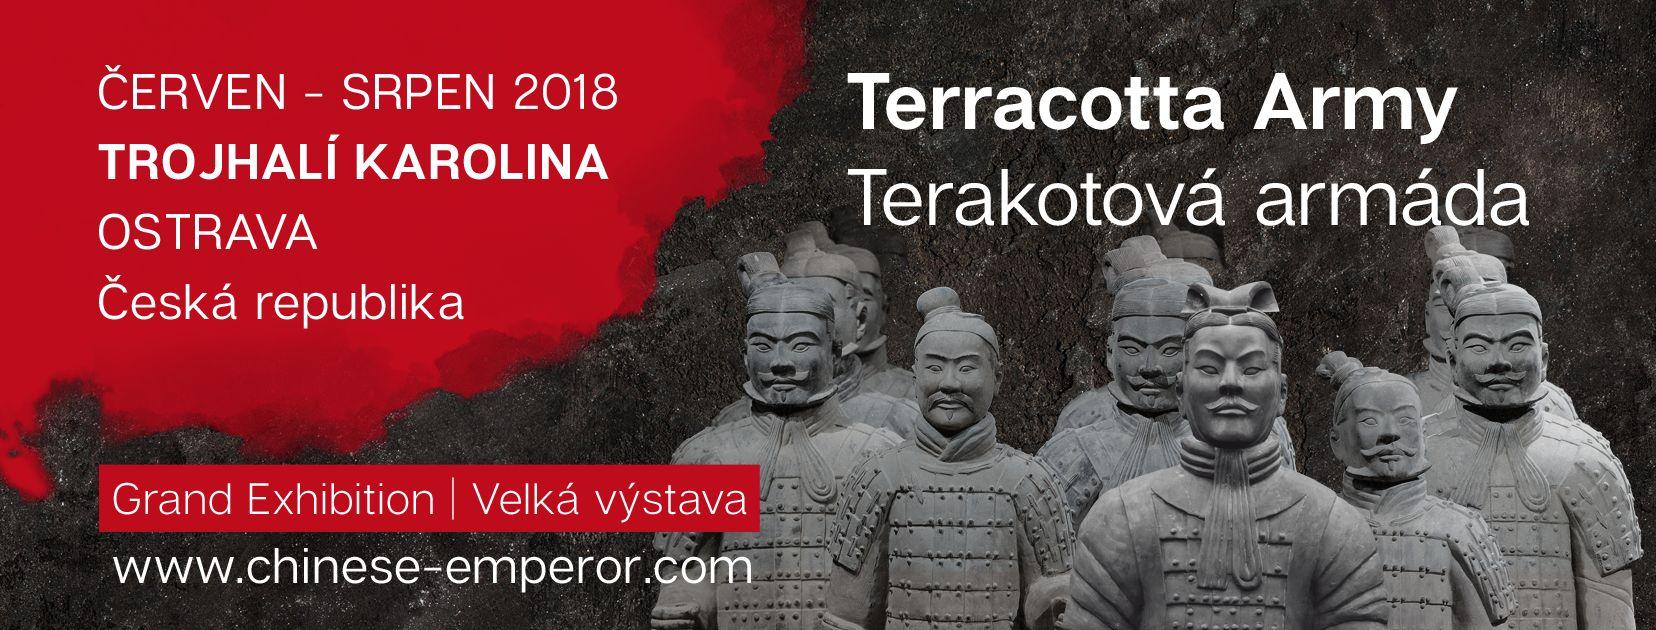 Výstava v Trojhalí Karolina Ostrava